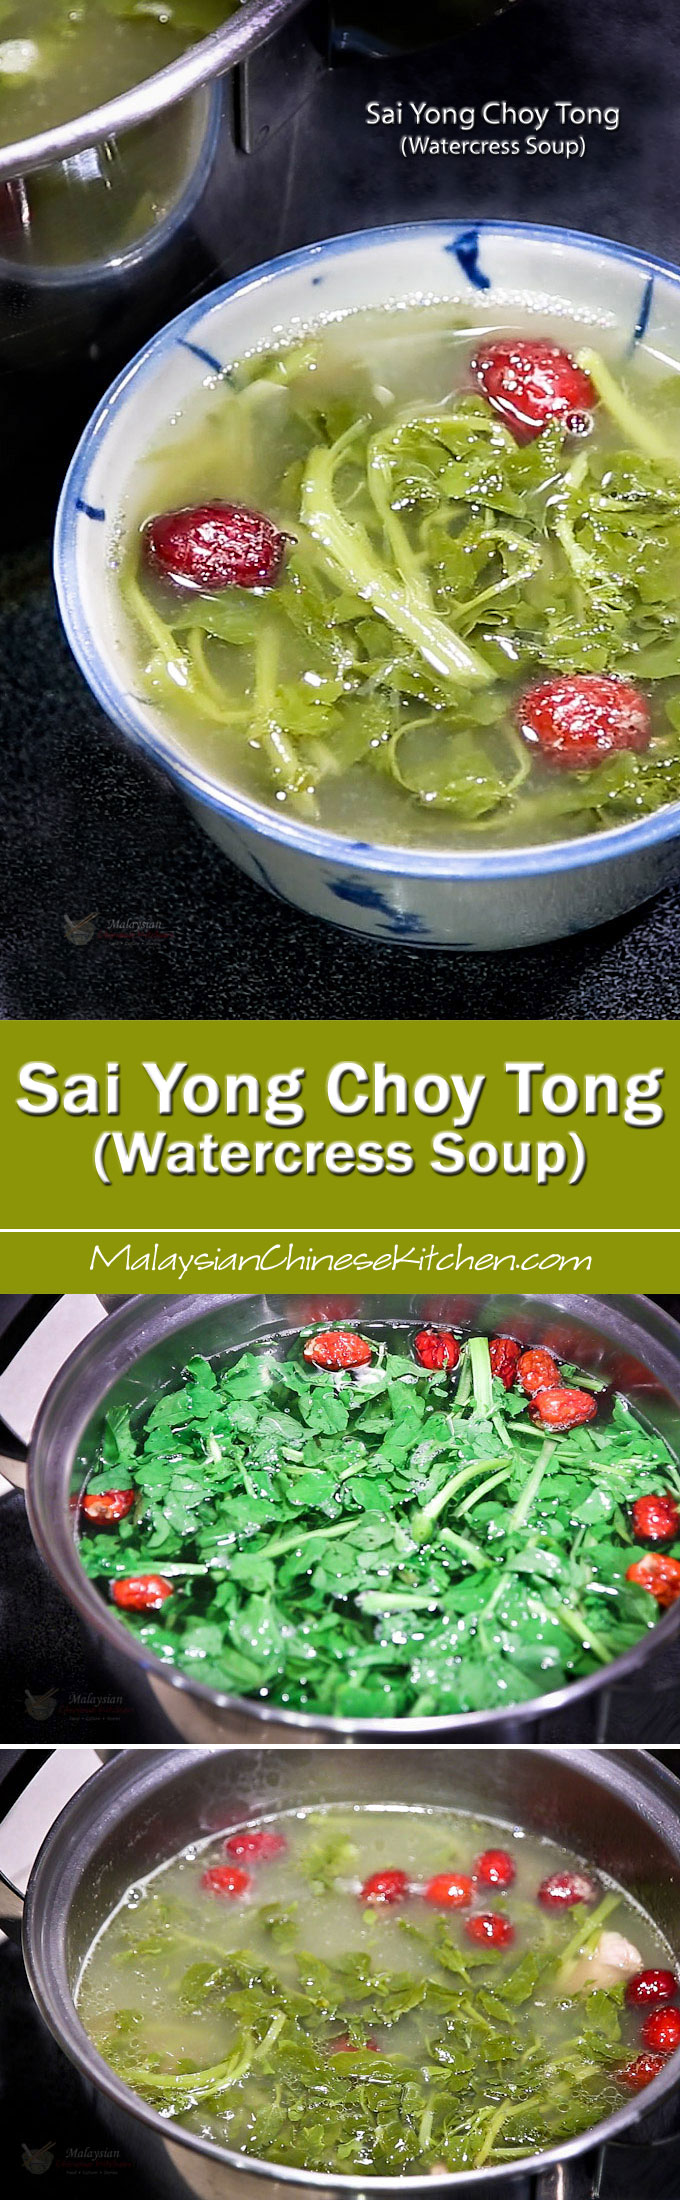 Sai Yong Choy Tong (Watercress Soup) is a slow boil, clear, and nourishing soup. It is very popular among the Malaysian Chinese. | MalaysianChineseKitchen.com